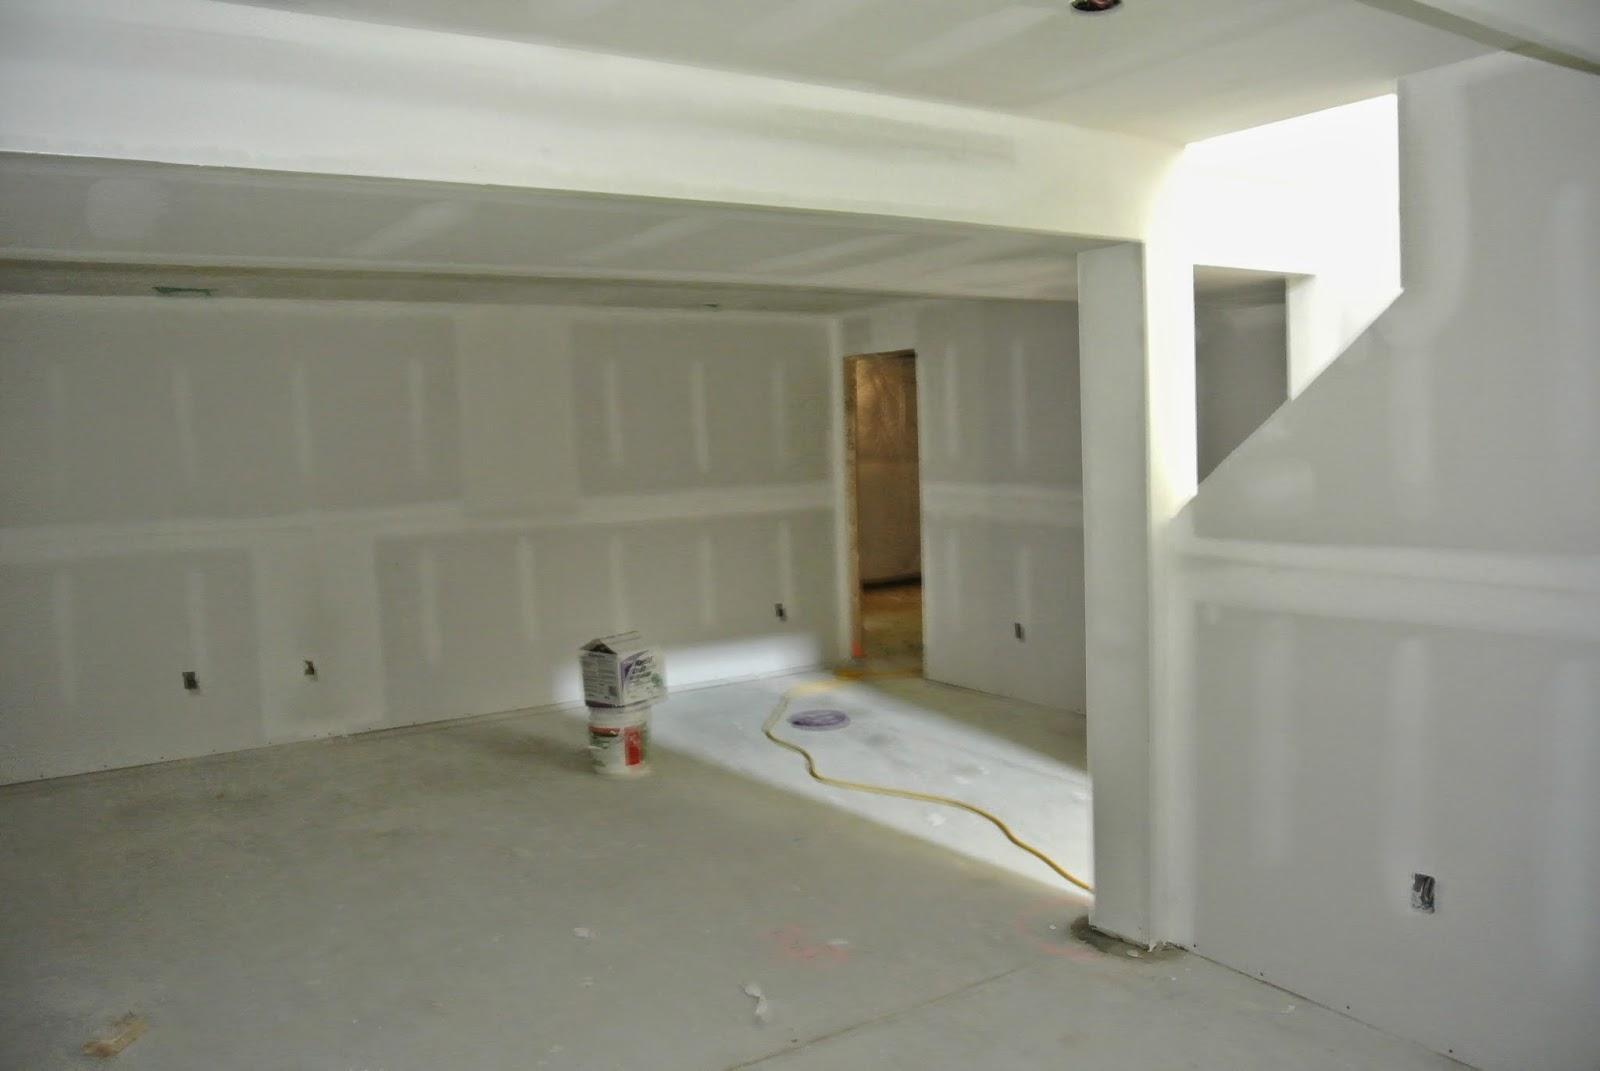 Building A Ryan Home: Drywall